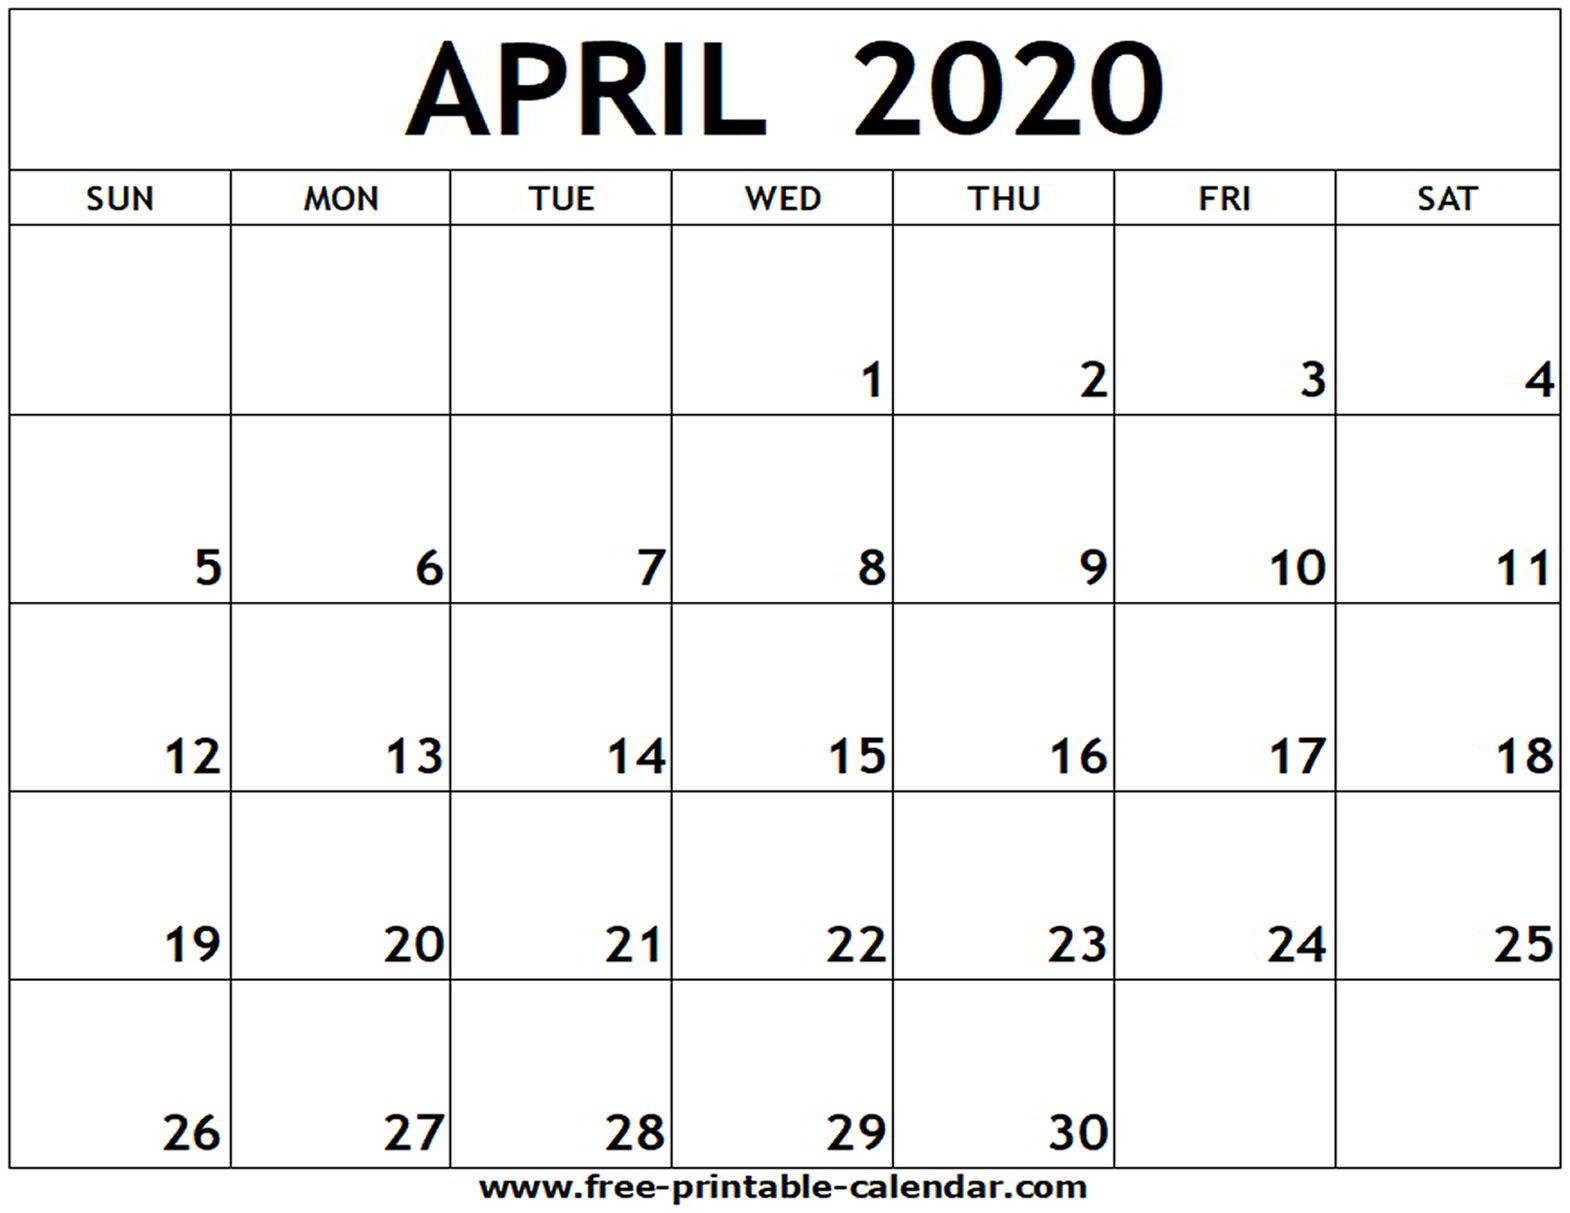 Blank Calendar Worksheet For April